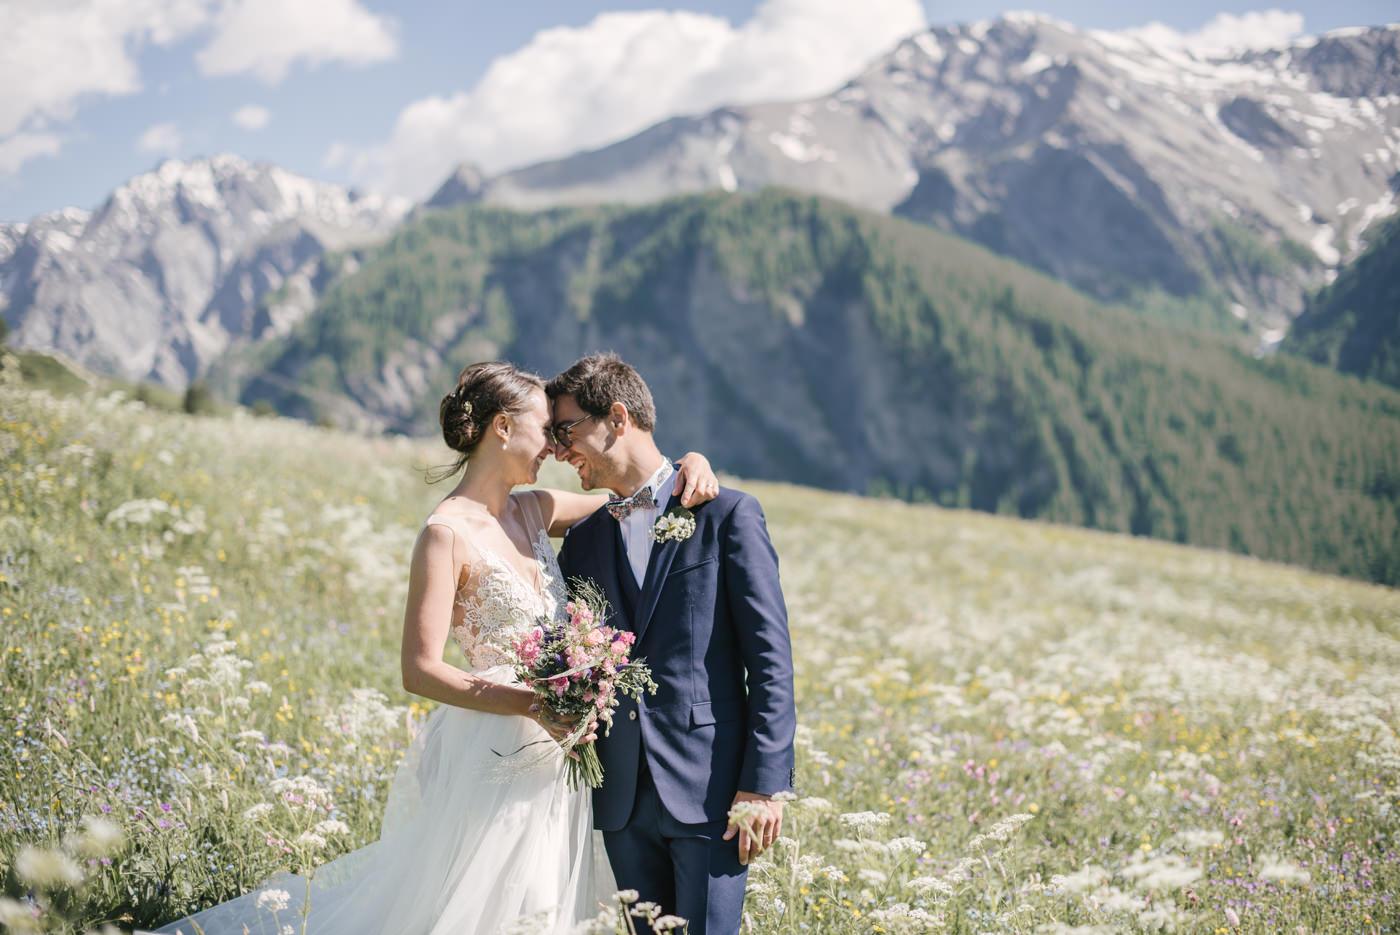 photographe-mariage-montagne-rhone-alpes-isere-grenoble-annecy-saint-veran-lisebery